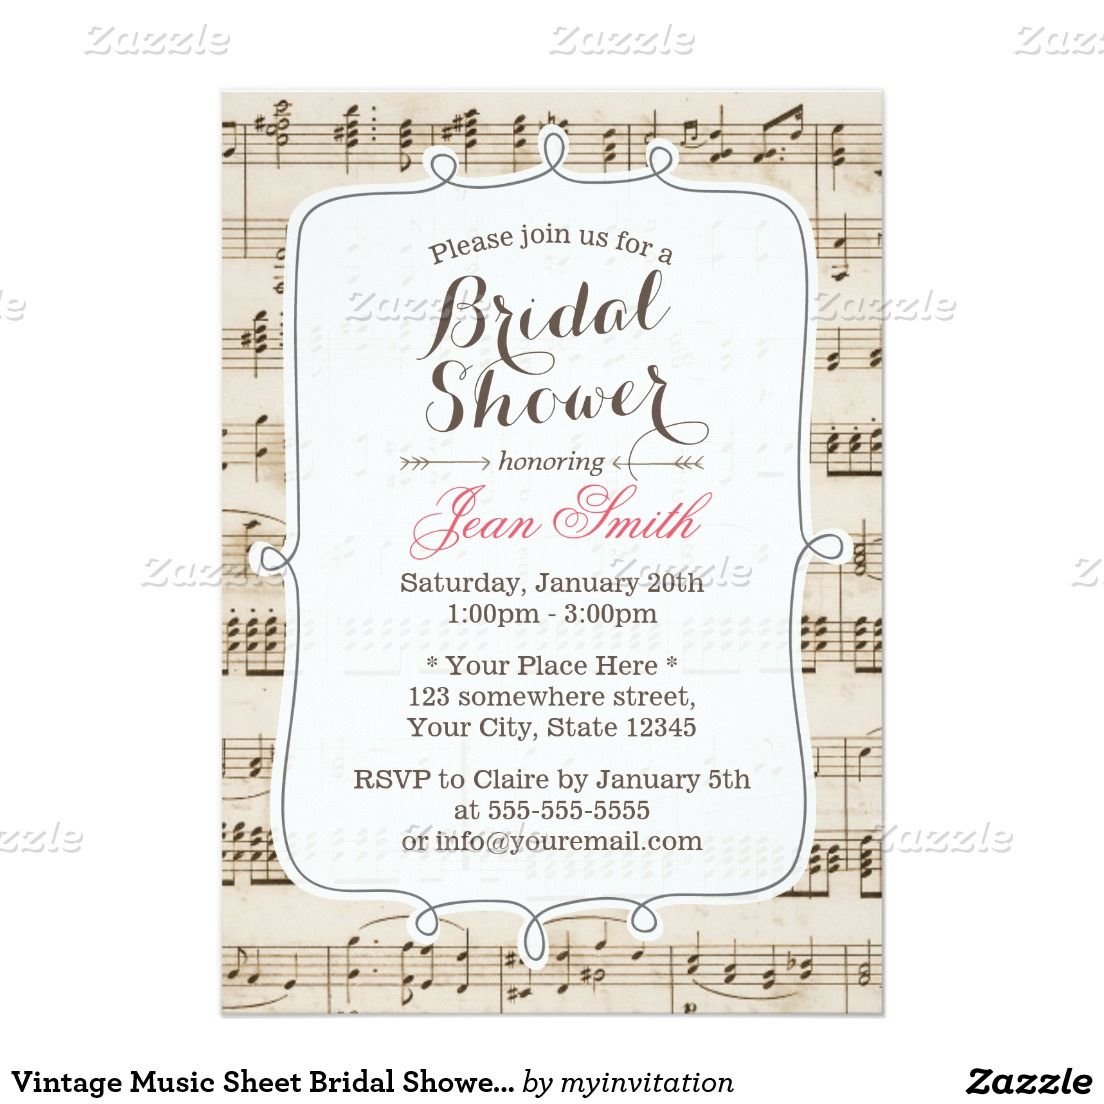 Vintage Music Sheet Bridal Shower Invitations 5\